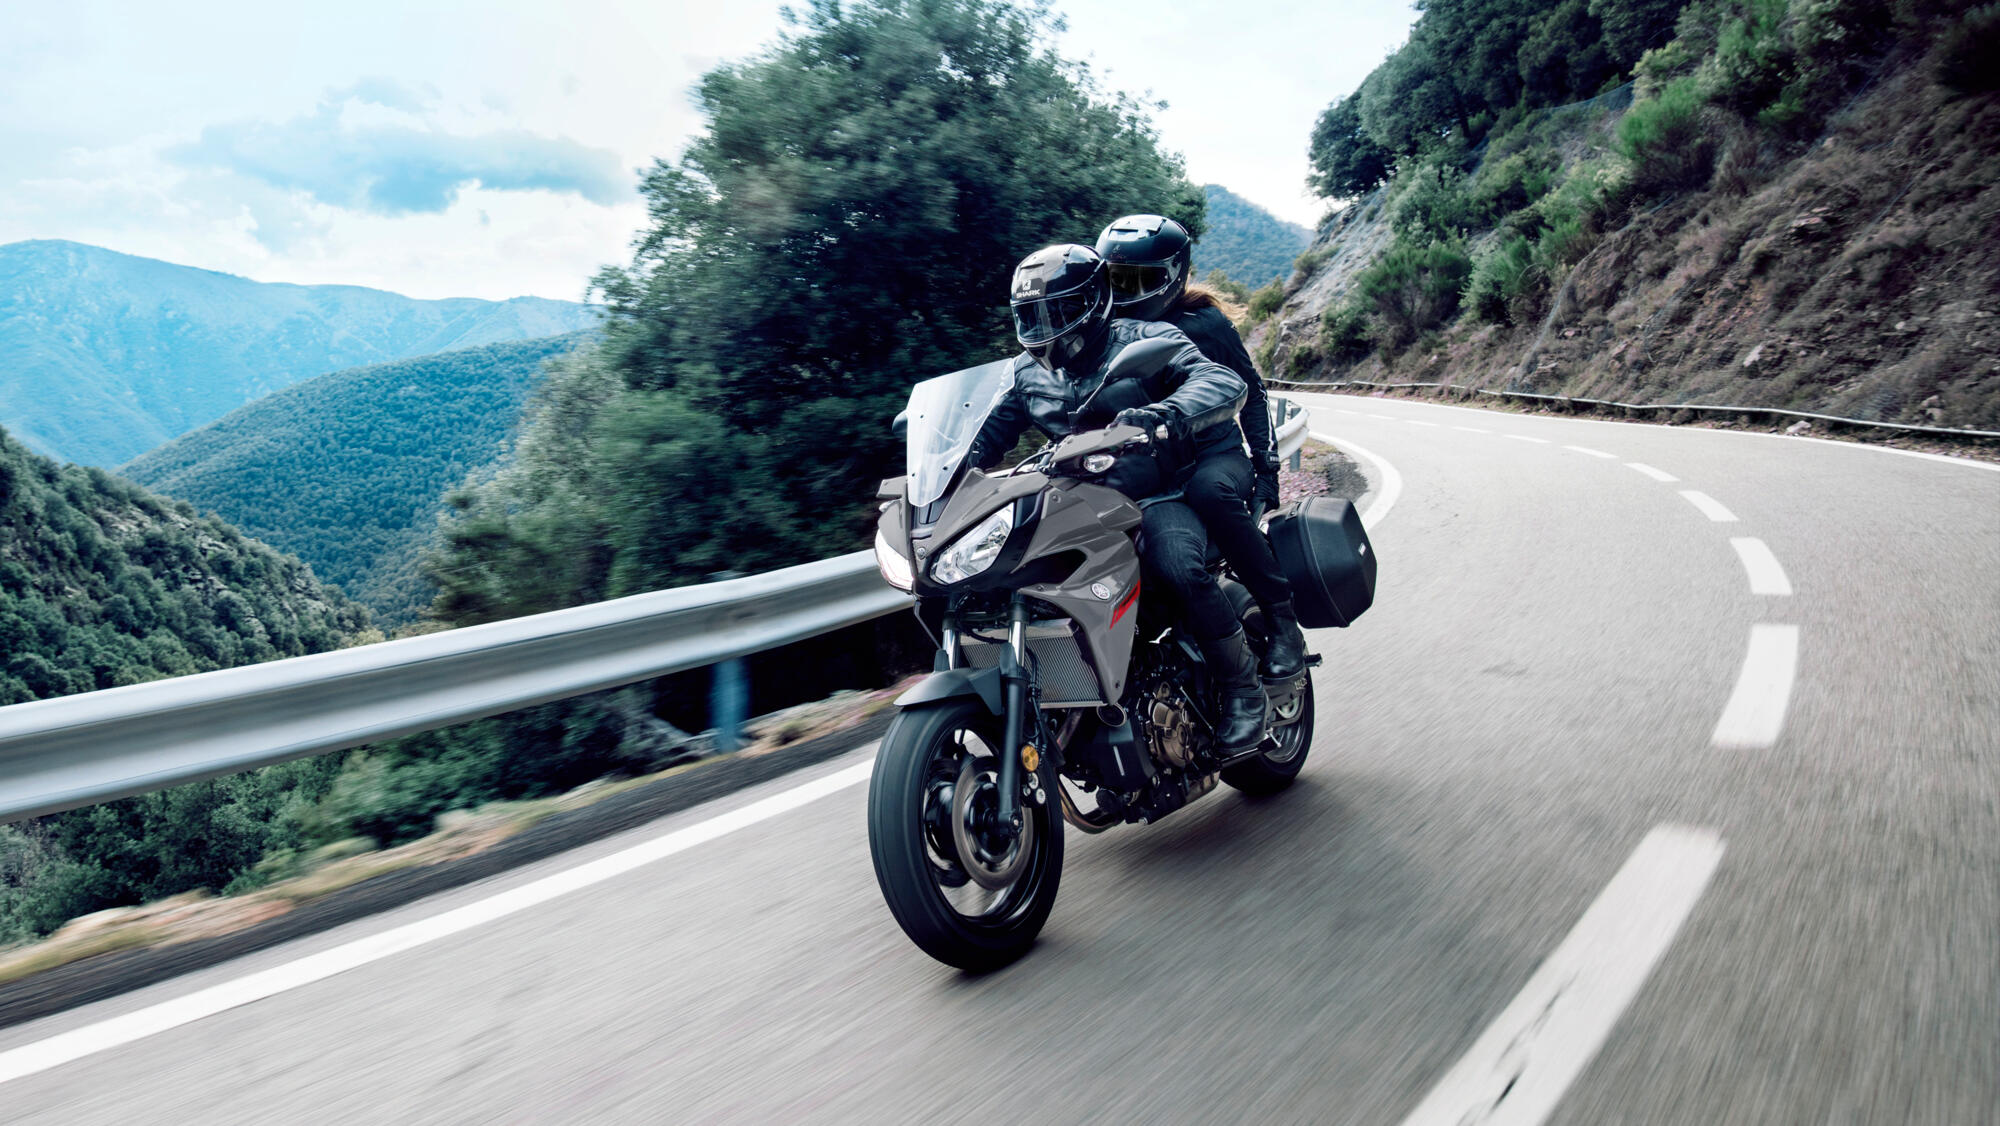 Tracer 700 - motorcycles - Yamaha Motor